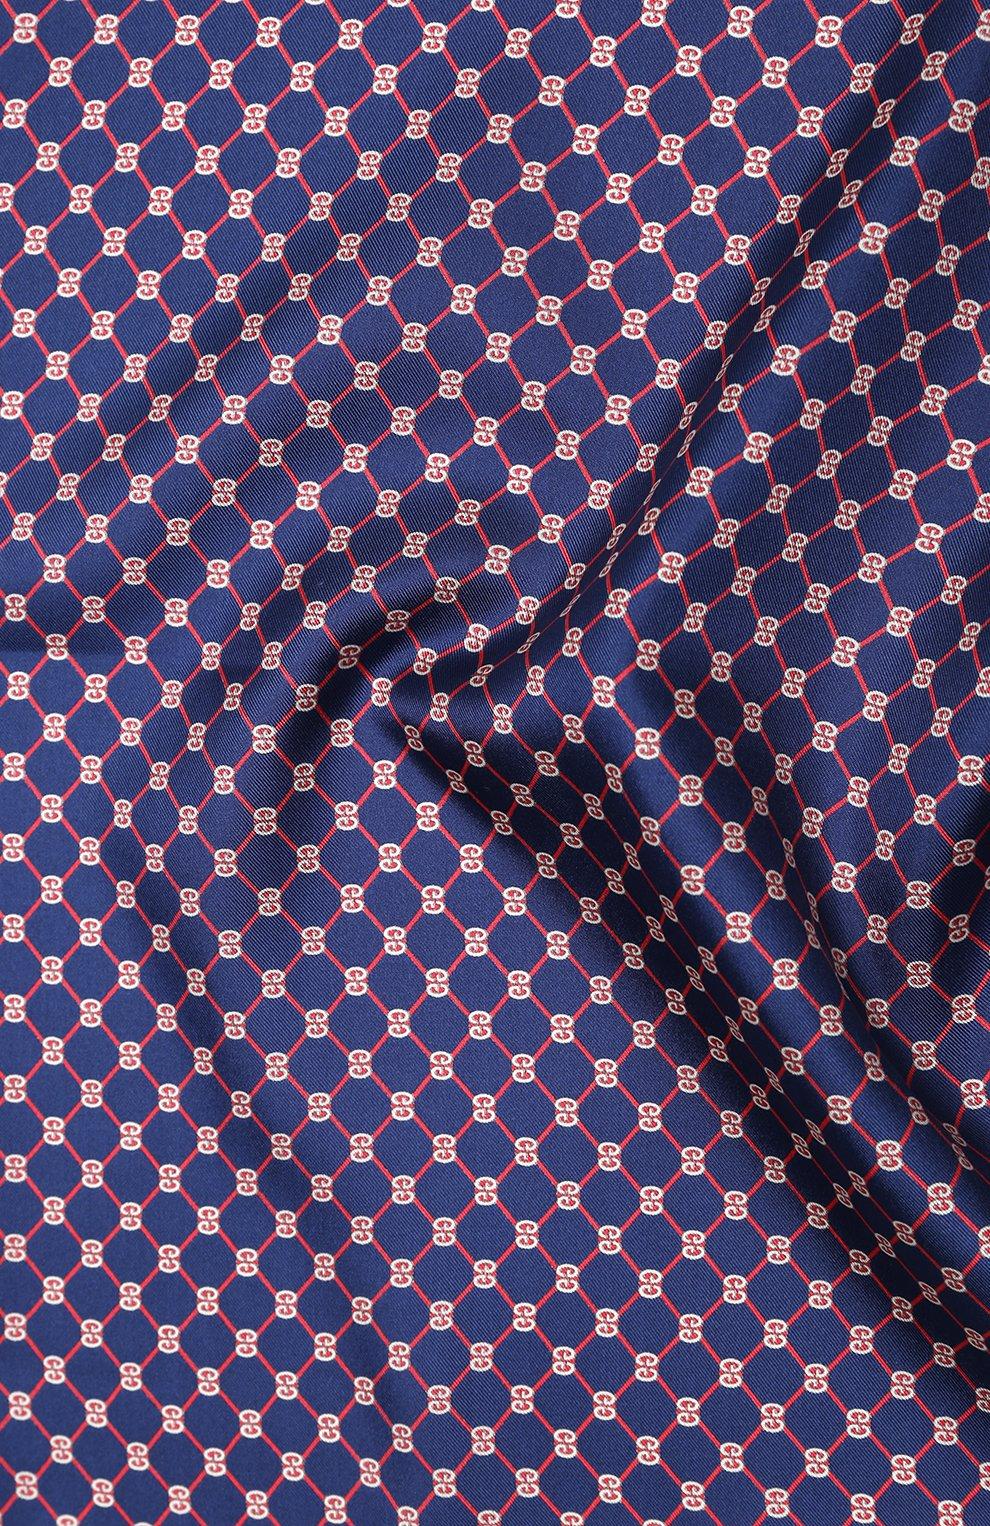 Мужской шелковый платок GUCCI синего цвета, арт. 630517/4G001   Фото 2